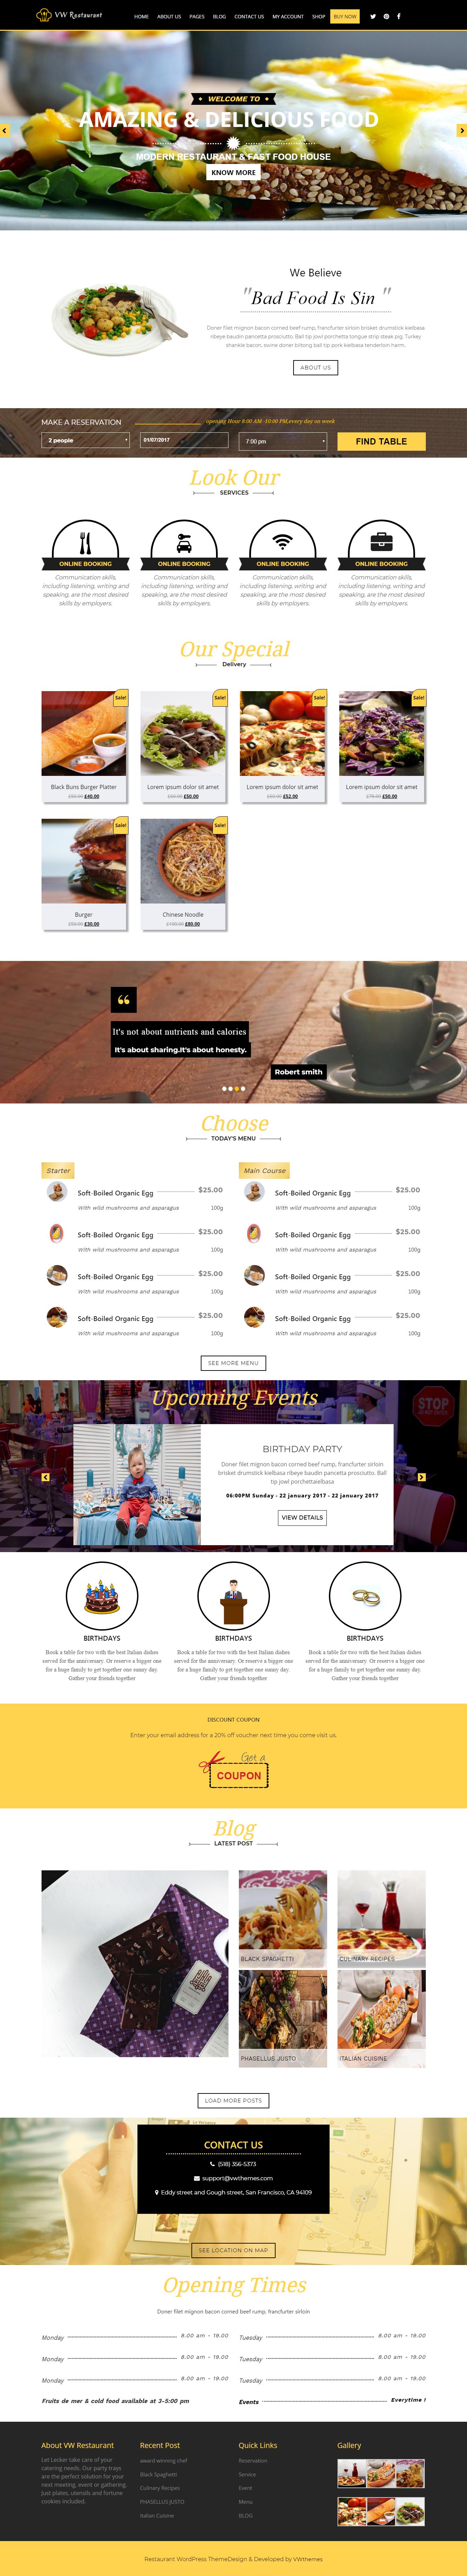 vw restaurant lite best free bar pub wordpress theme - 10+ Best Free Bar and Pub WordPress Themes